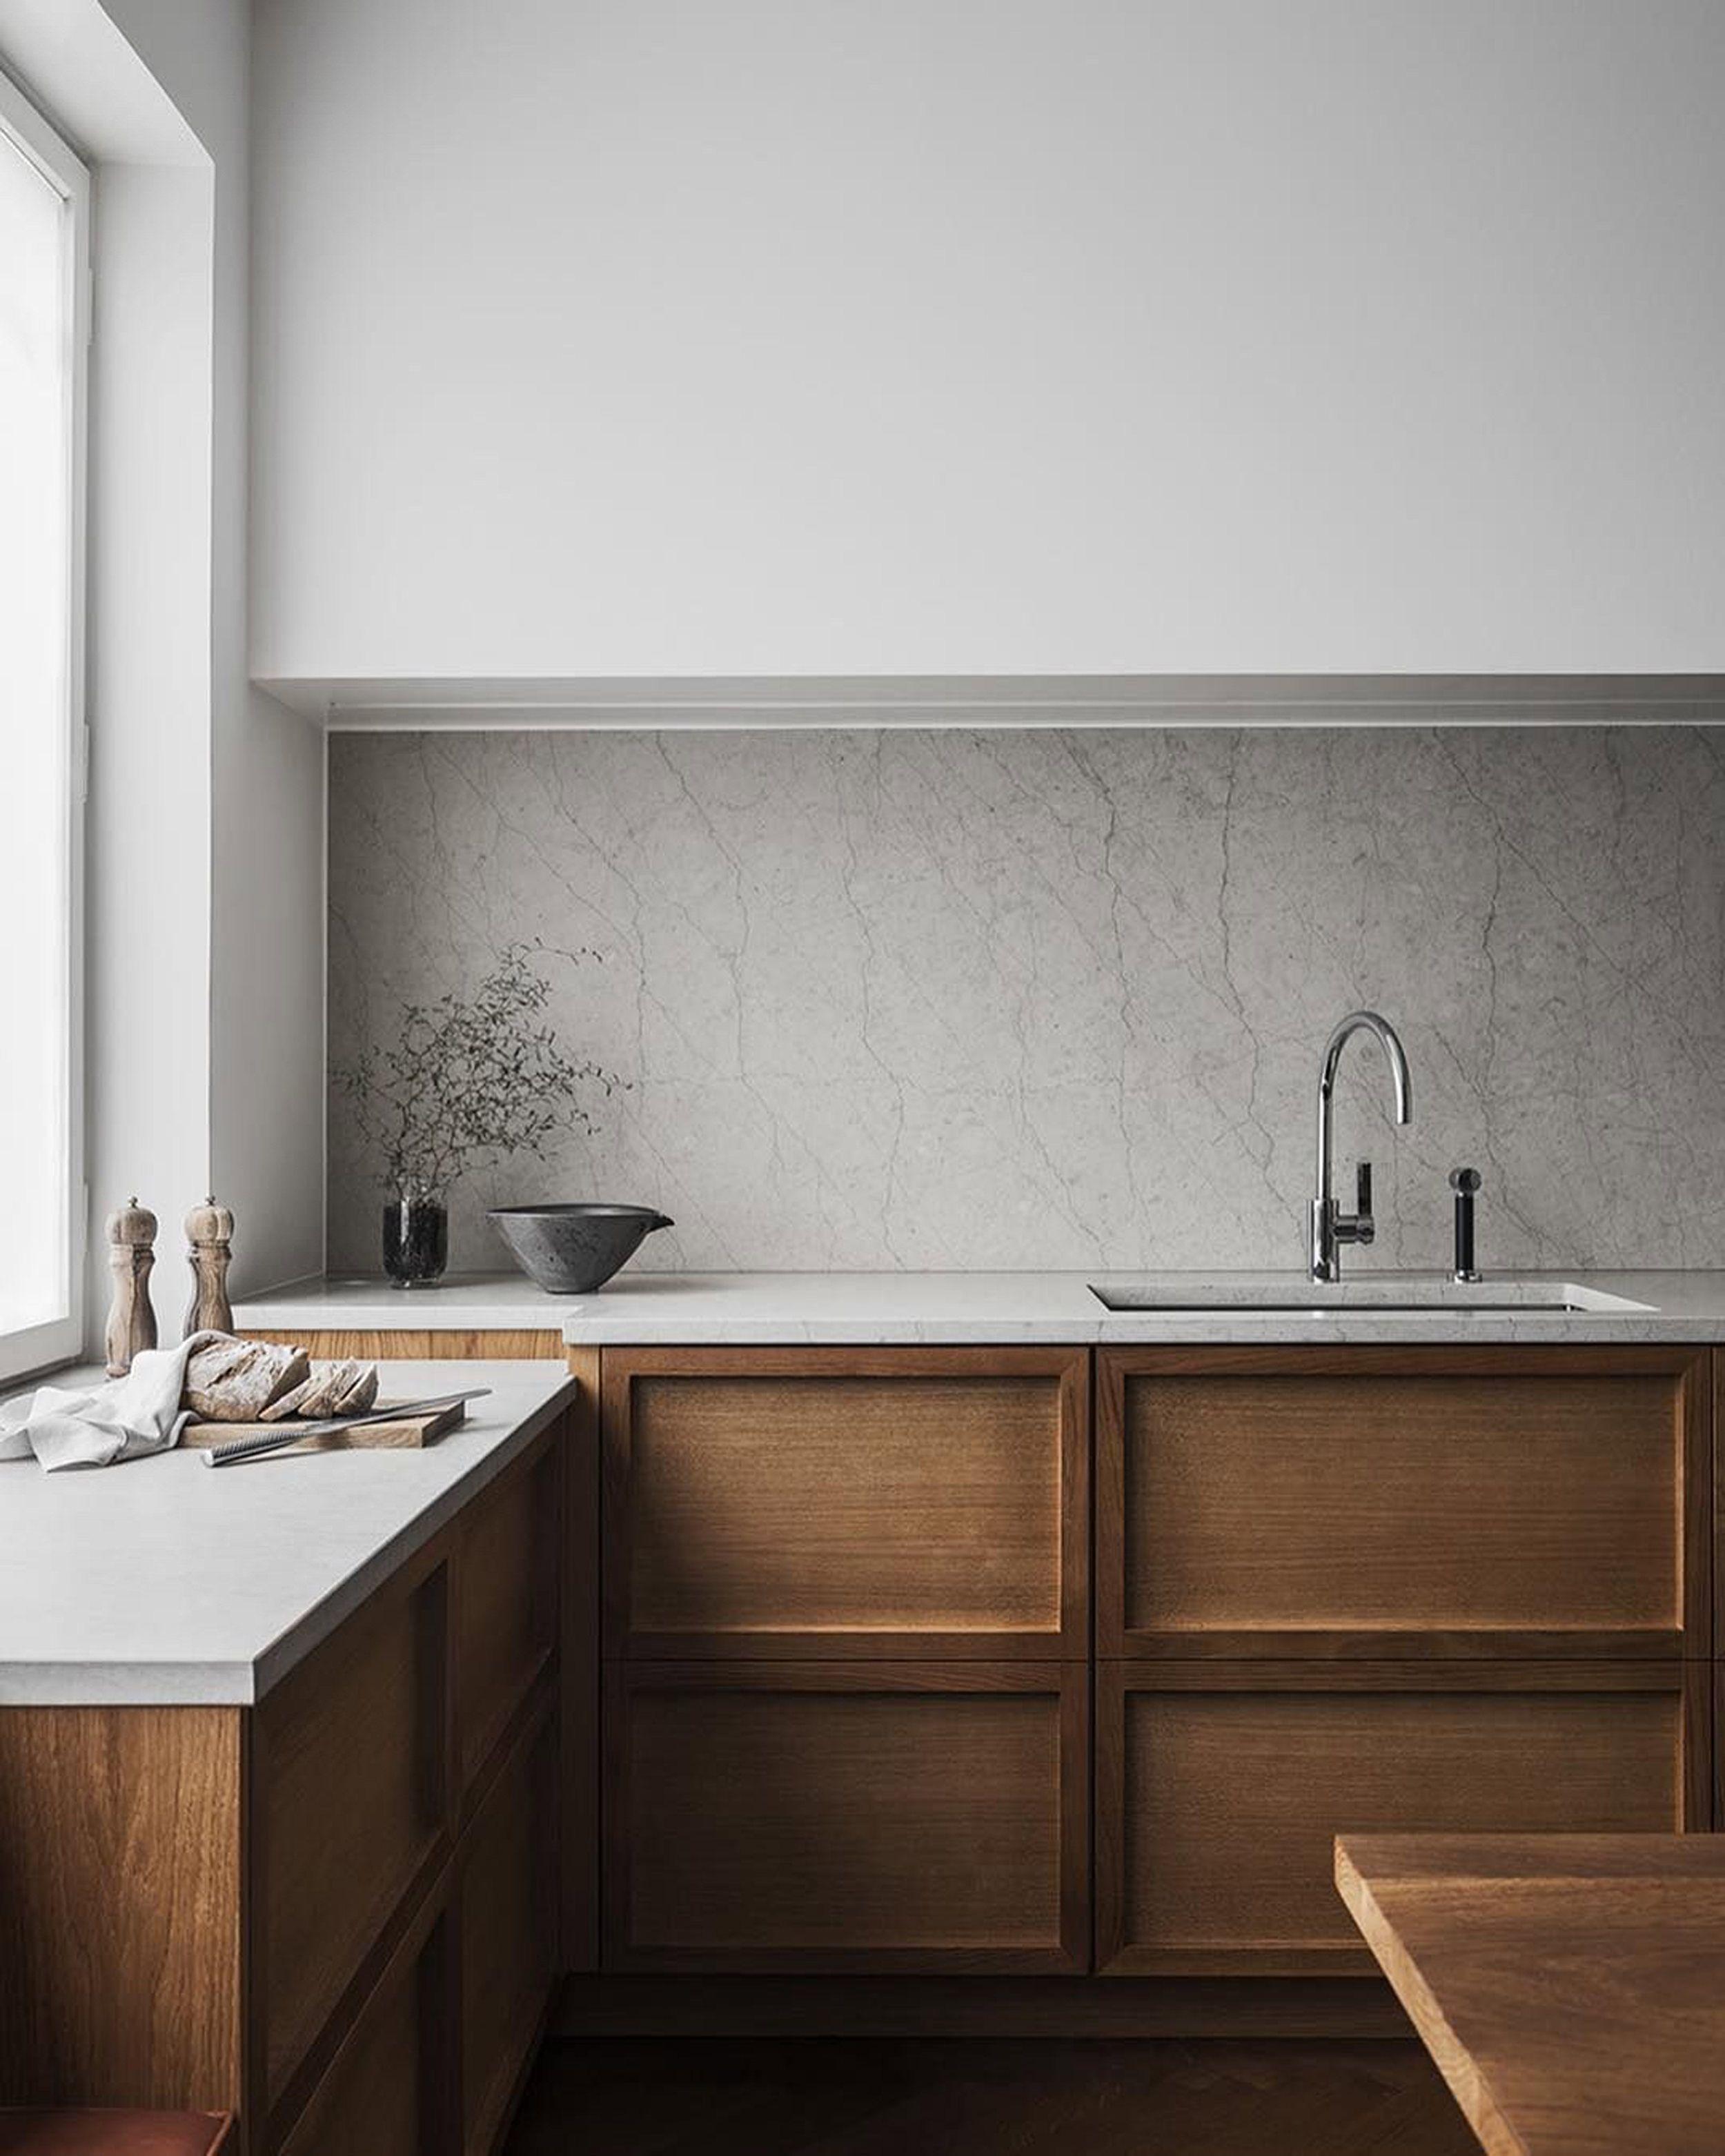 emily henderson design trends 2018 kitchen no upper cabinets 05